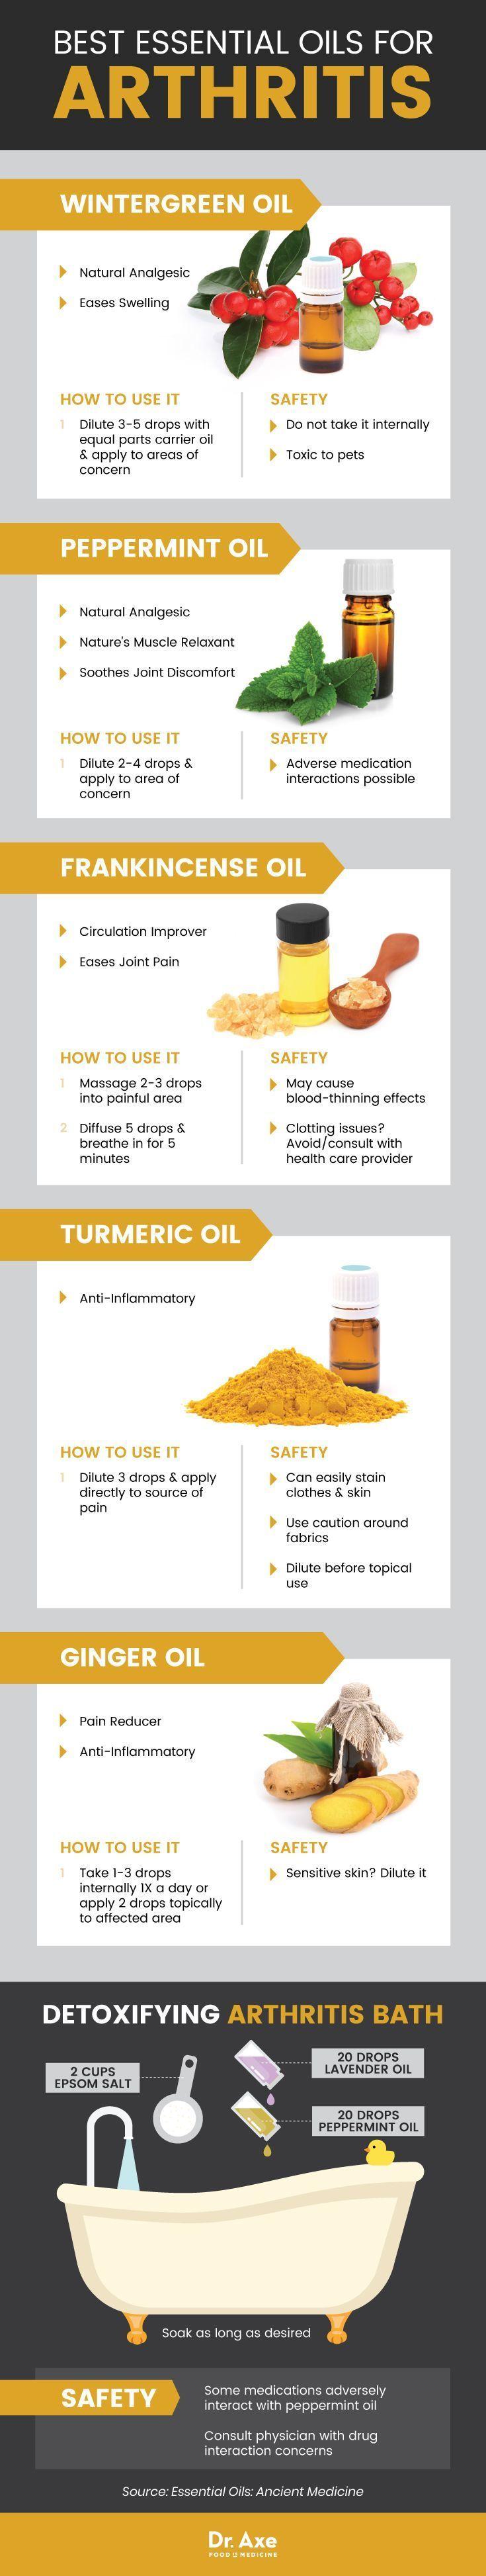 Best essential oils for Arthritis #essentialoils #arthritis #arthritisinfo